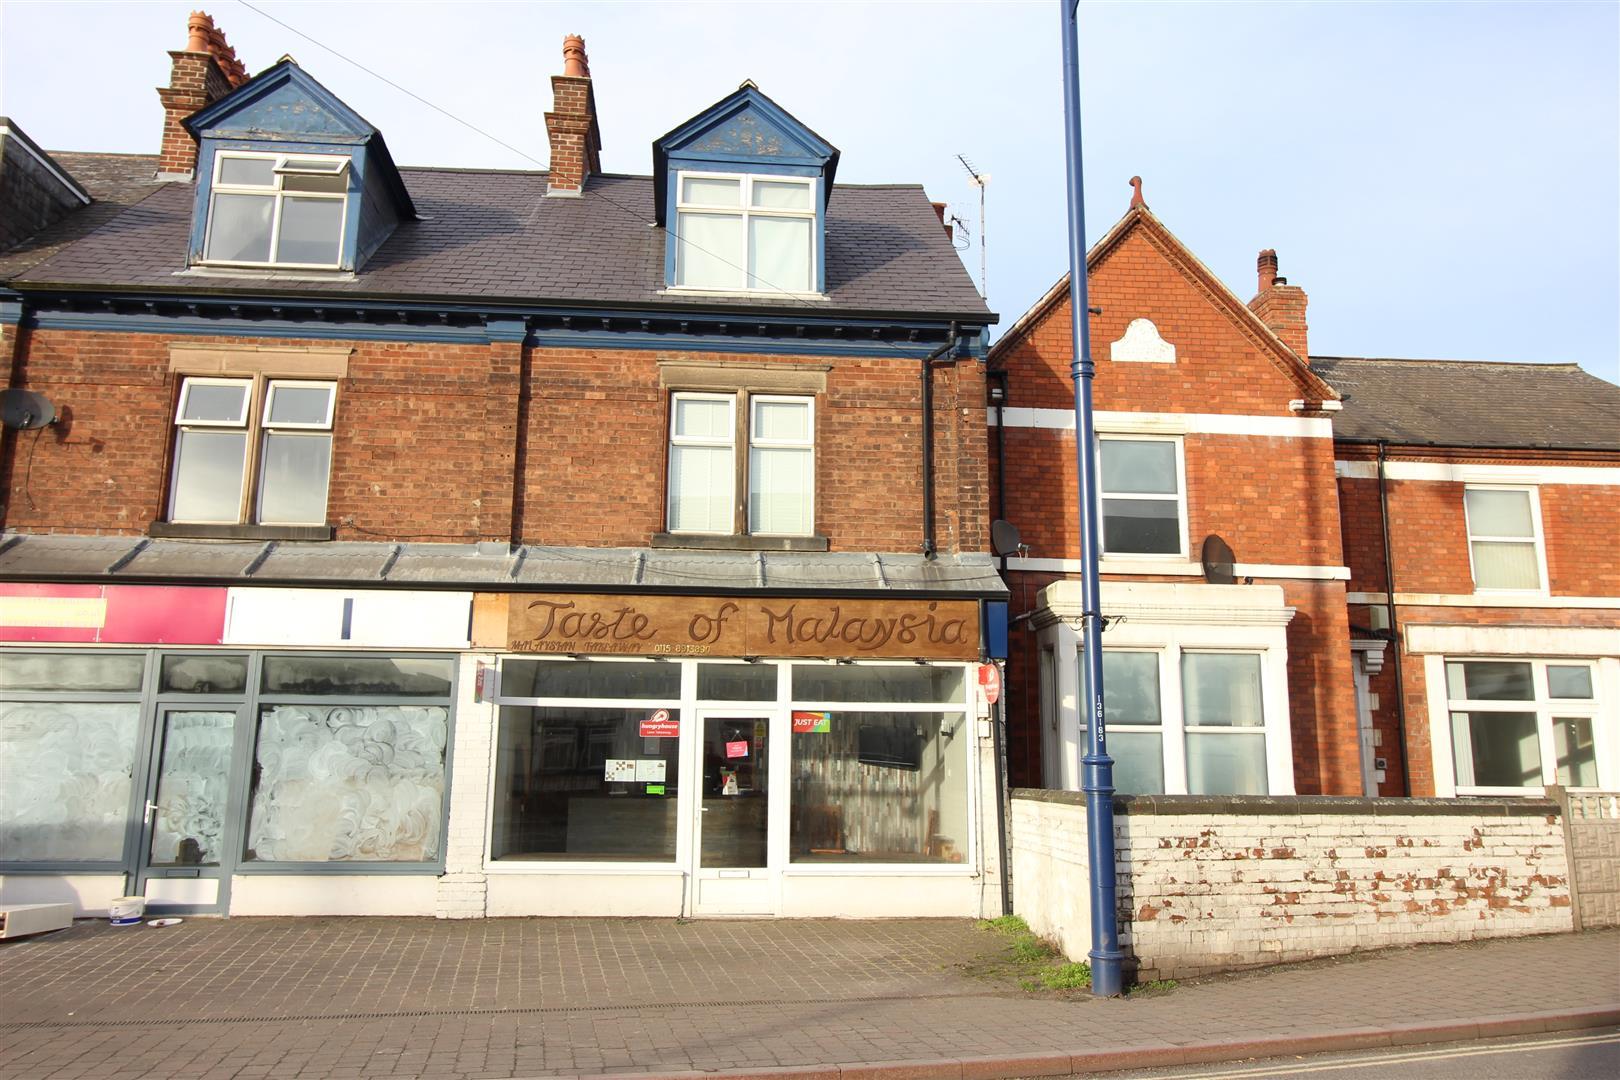 2 Bedrooms Shop Commercial for sale in Station Road, Sandiacre, Nottingham